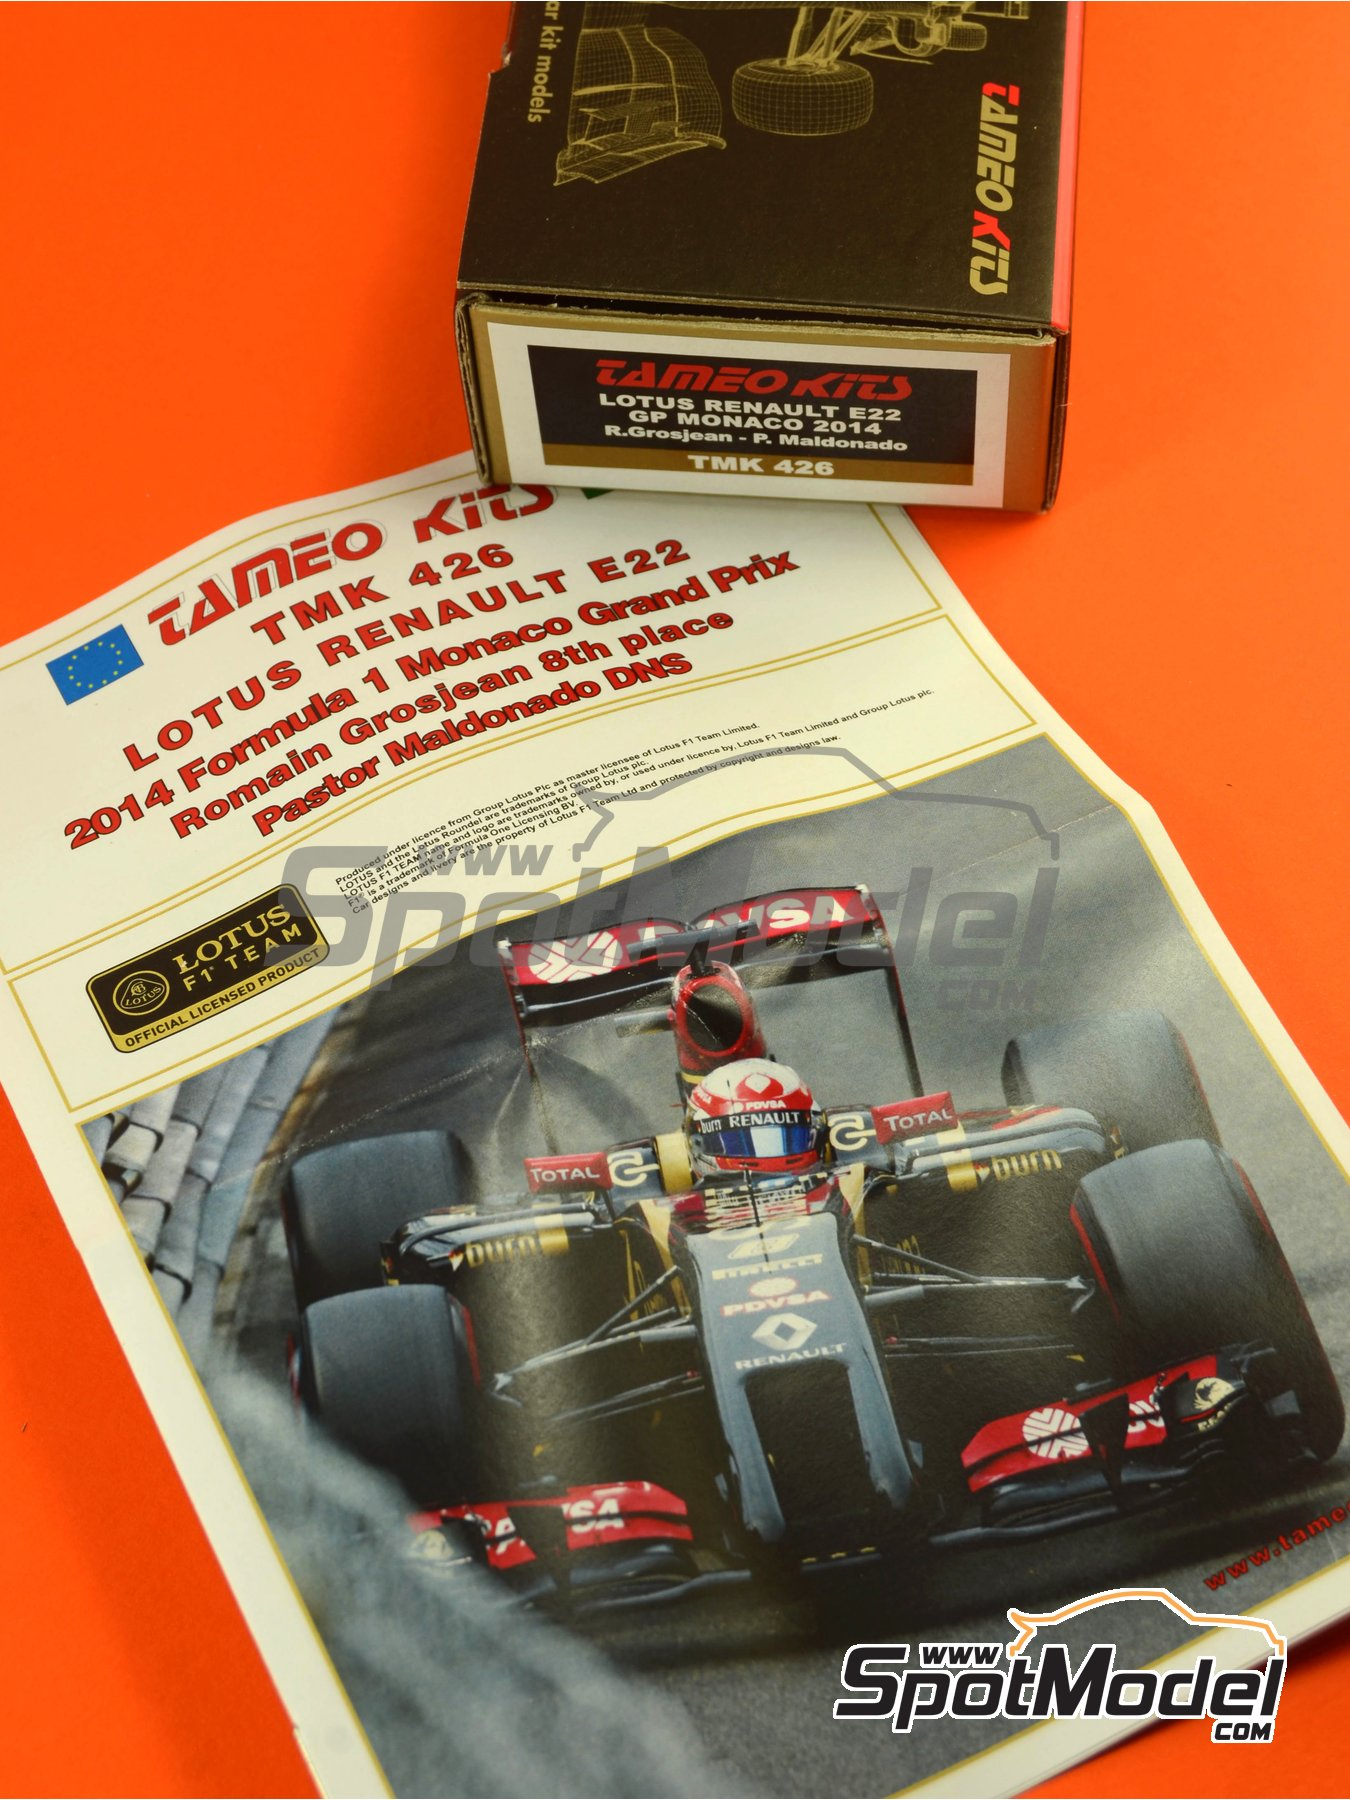 Lotus Renault E22 Rexona - Monaco Formula 1 Grand Prix 2014 | Model car kit in 1/43 scale manufactured by Tameo Kits (ref.TMK426) image